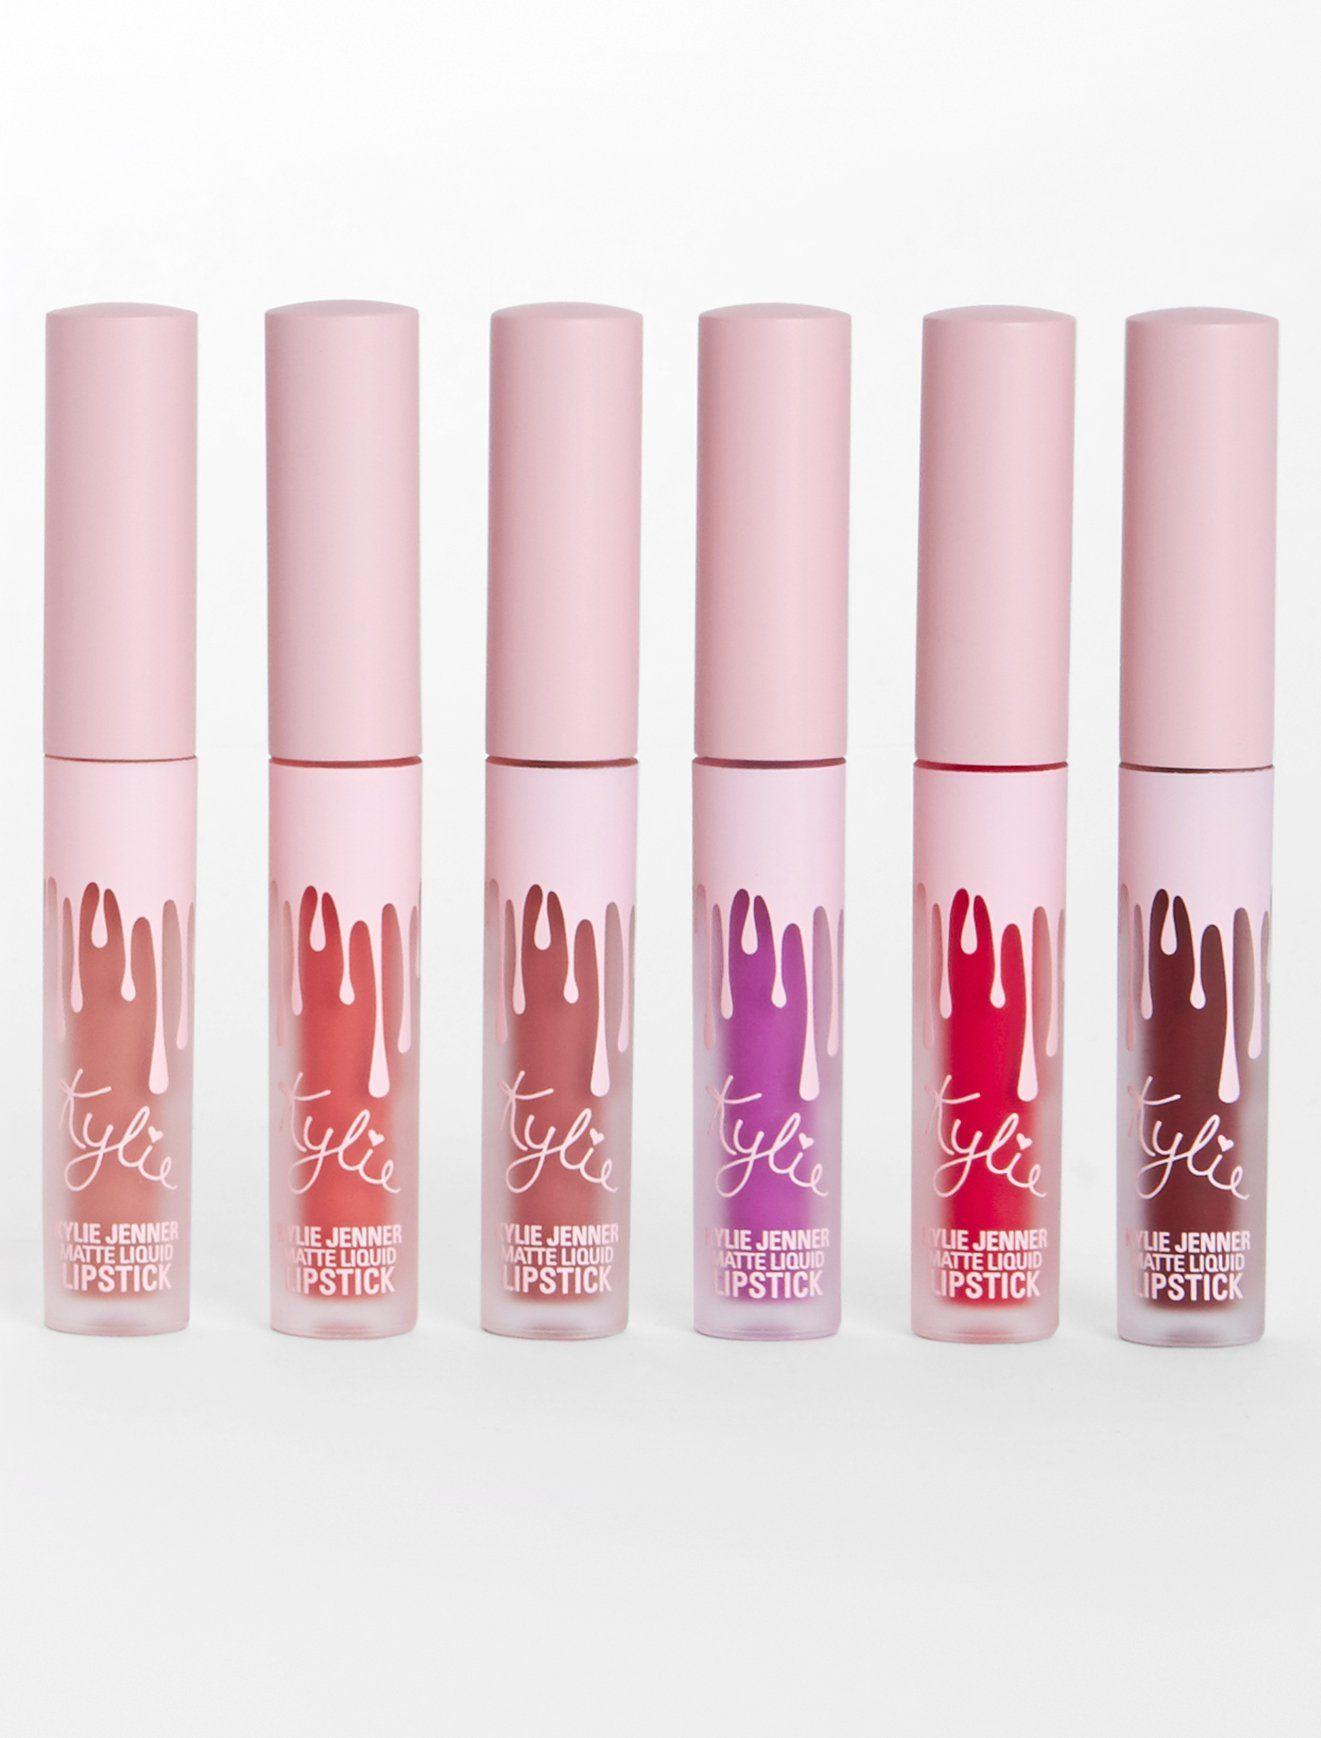 Wishlist - Kylie Cosmetics The Birthday Collection | Mini Kit Matte Liquid Lipsticks